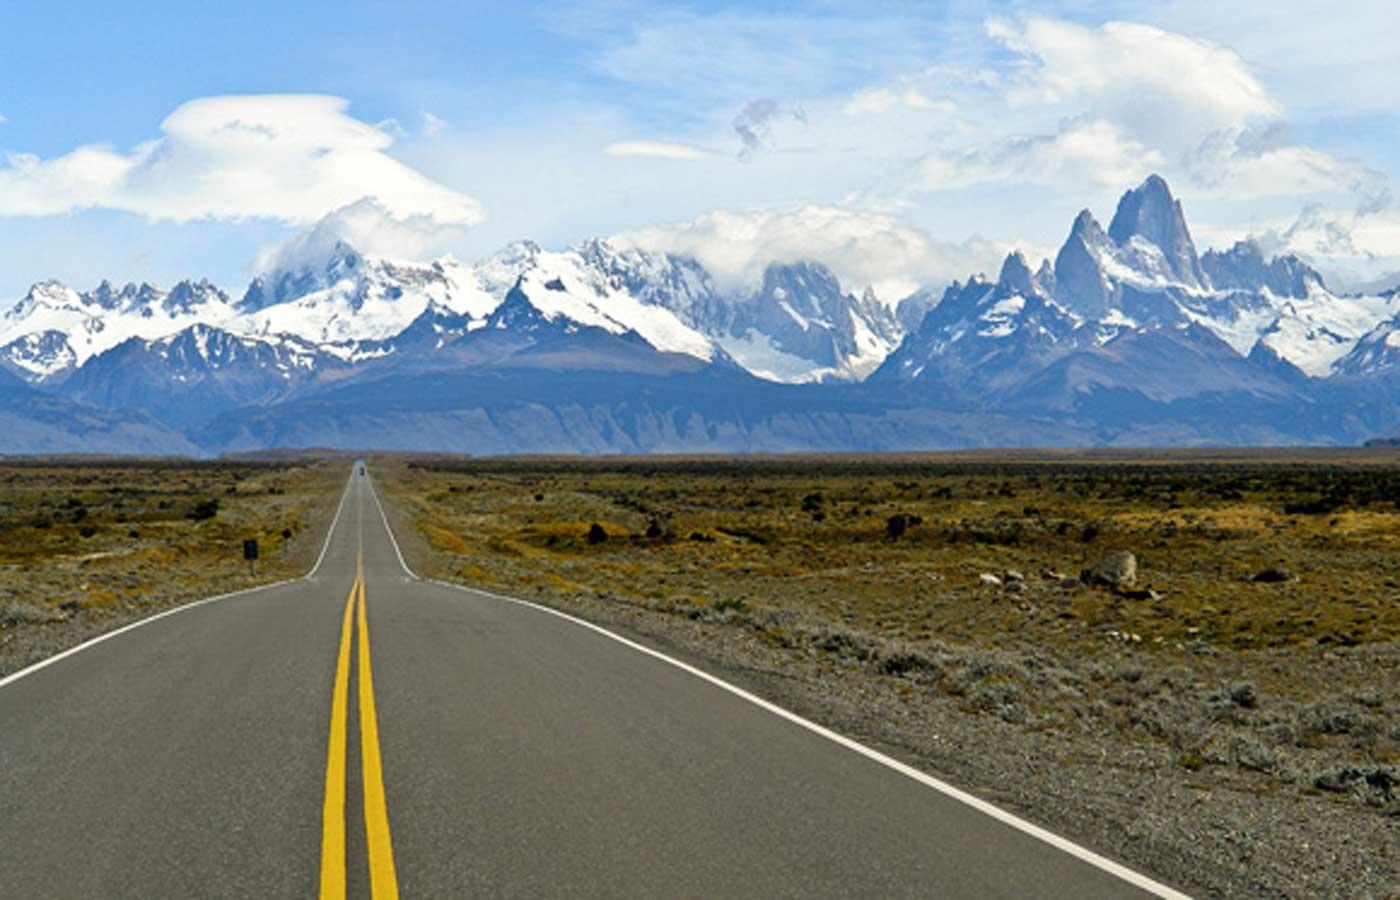 Carratera Austral, Route 40, Chile